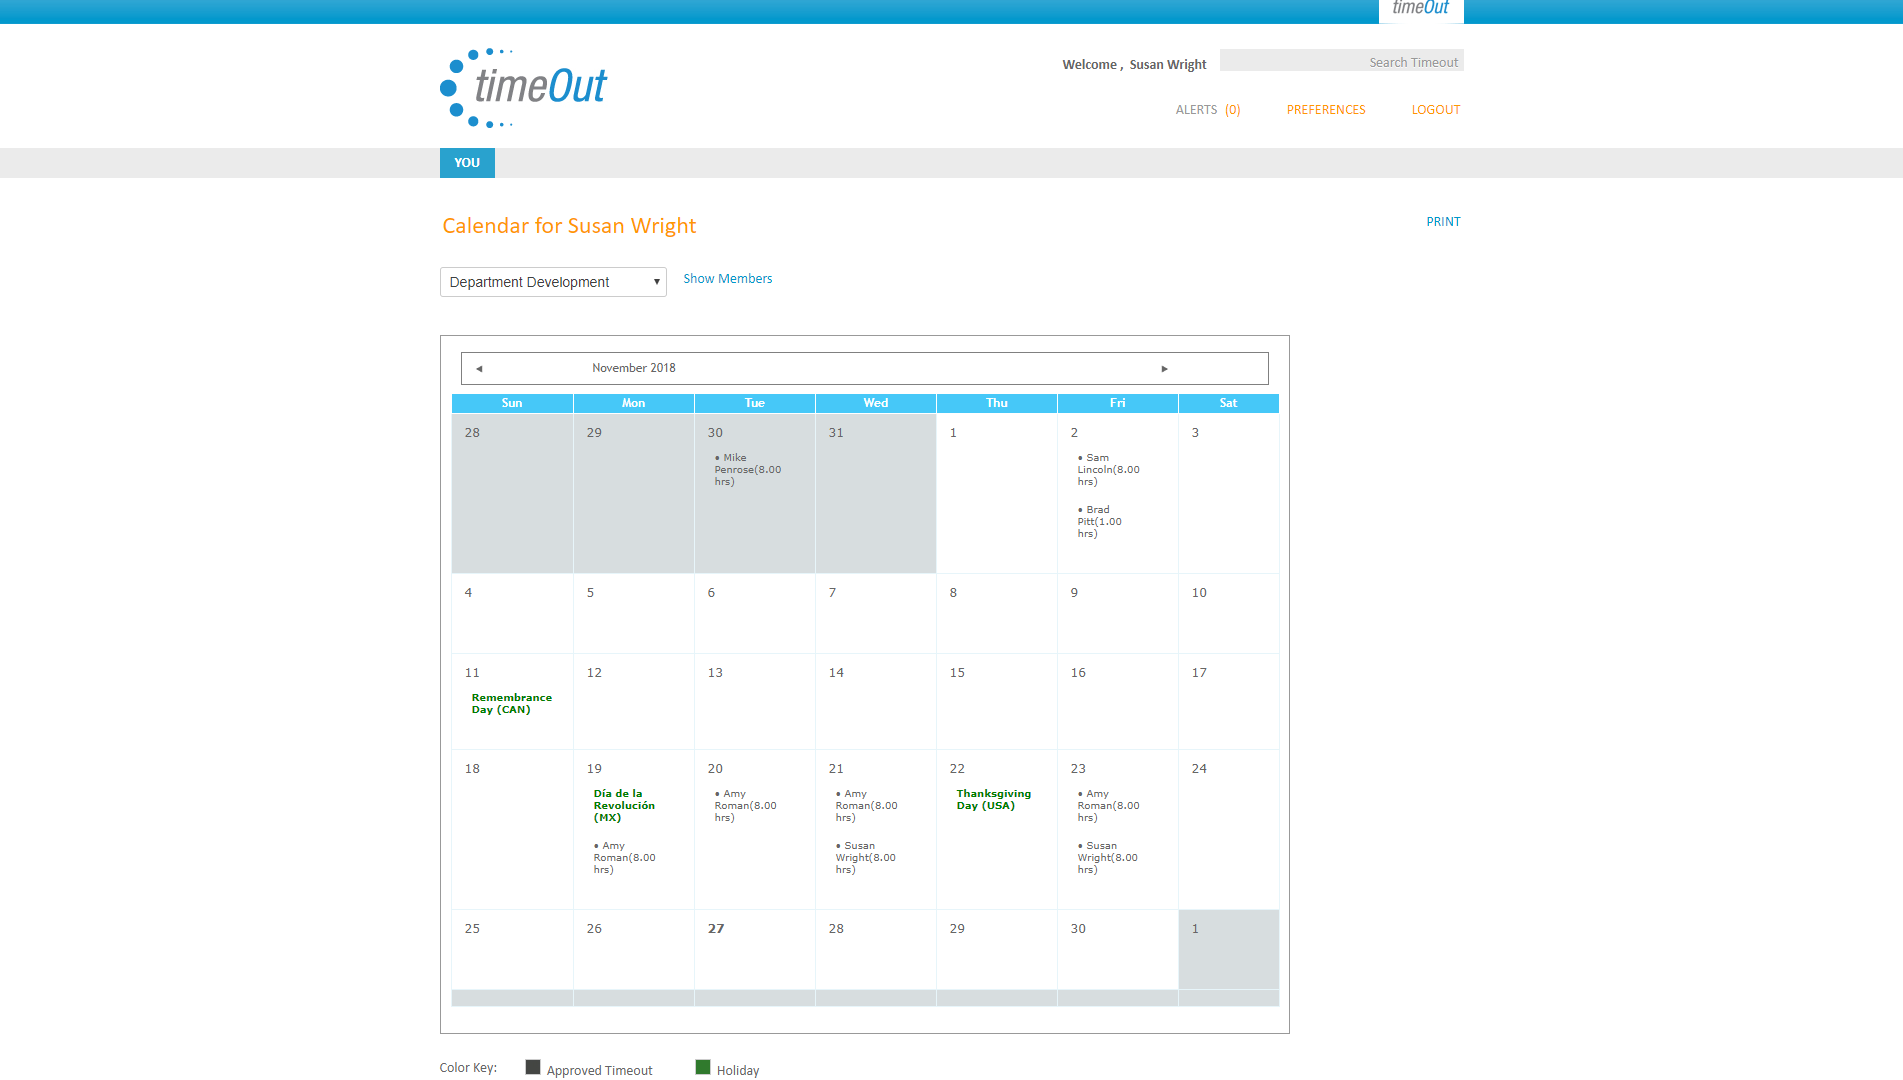 TimeOut - Calendar